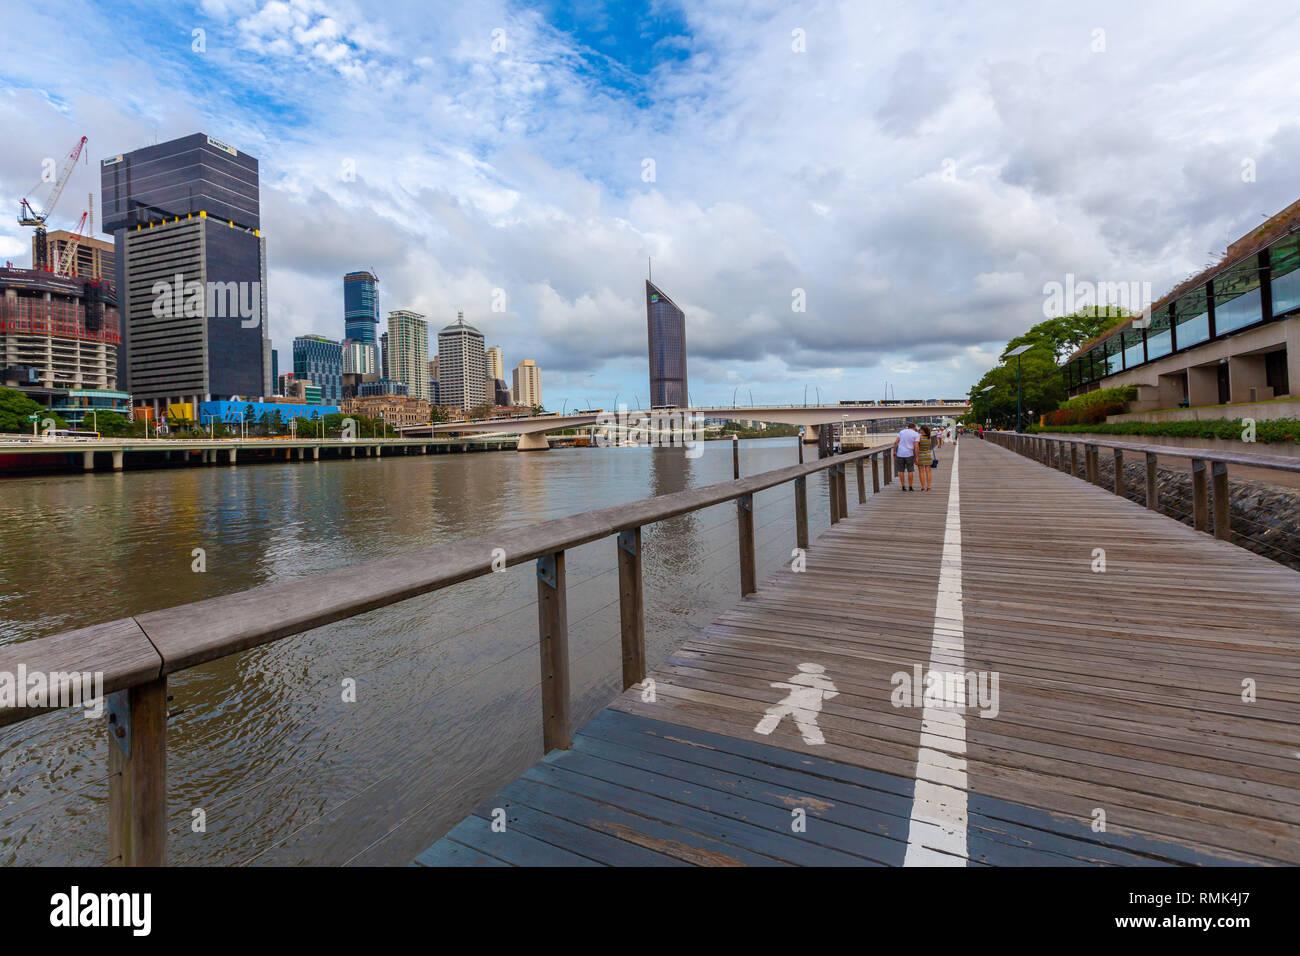 BRISBANE, Australia - January 9 2019: Wooden boardwalk along Brisbane river - Stock Image